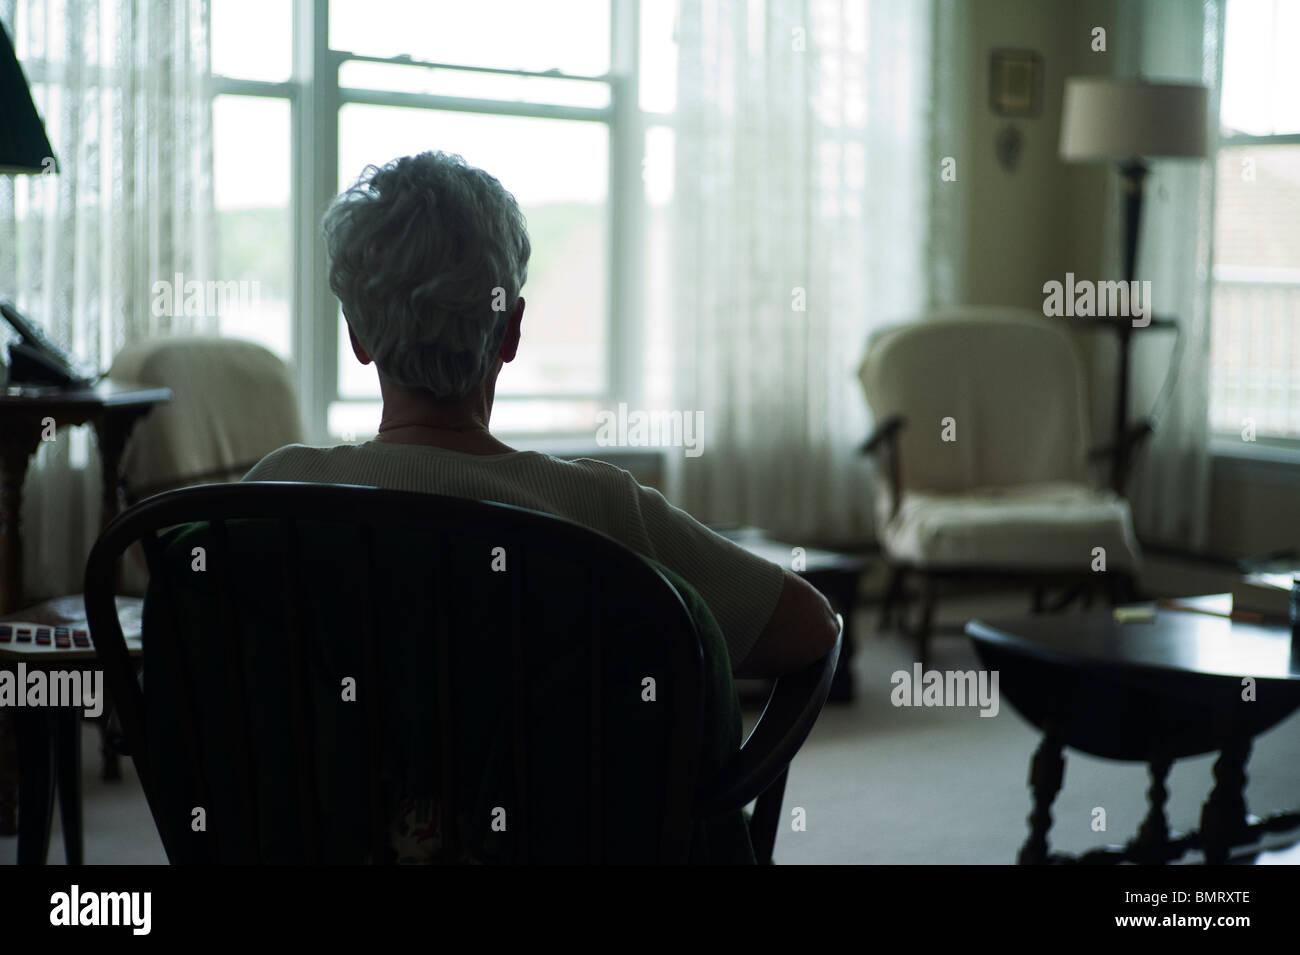 Anciana desde detrás, sentada mirando por la ventana. Imagen De Stock